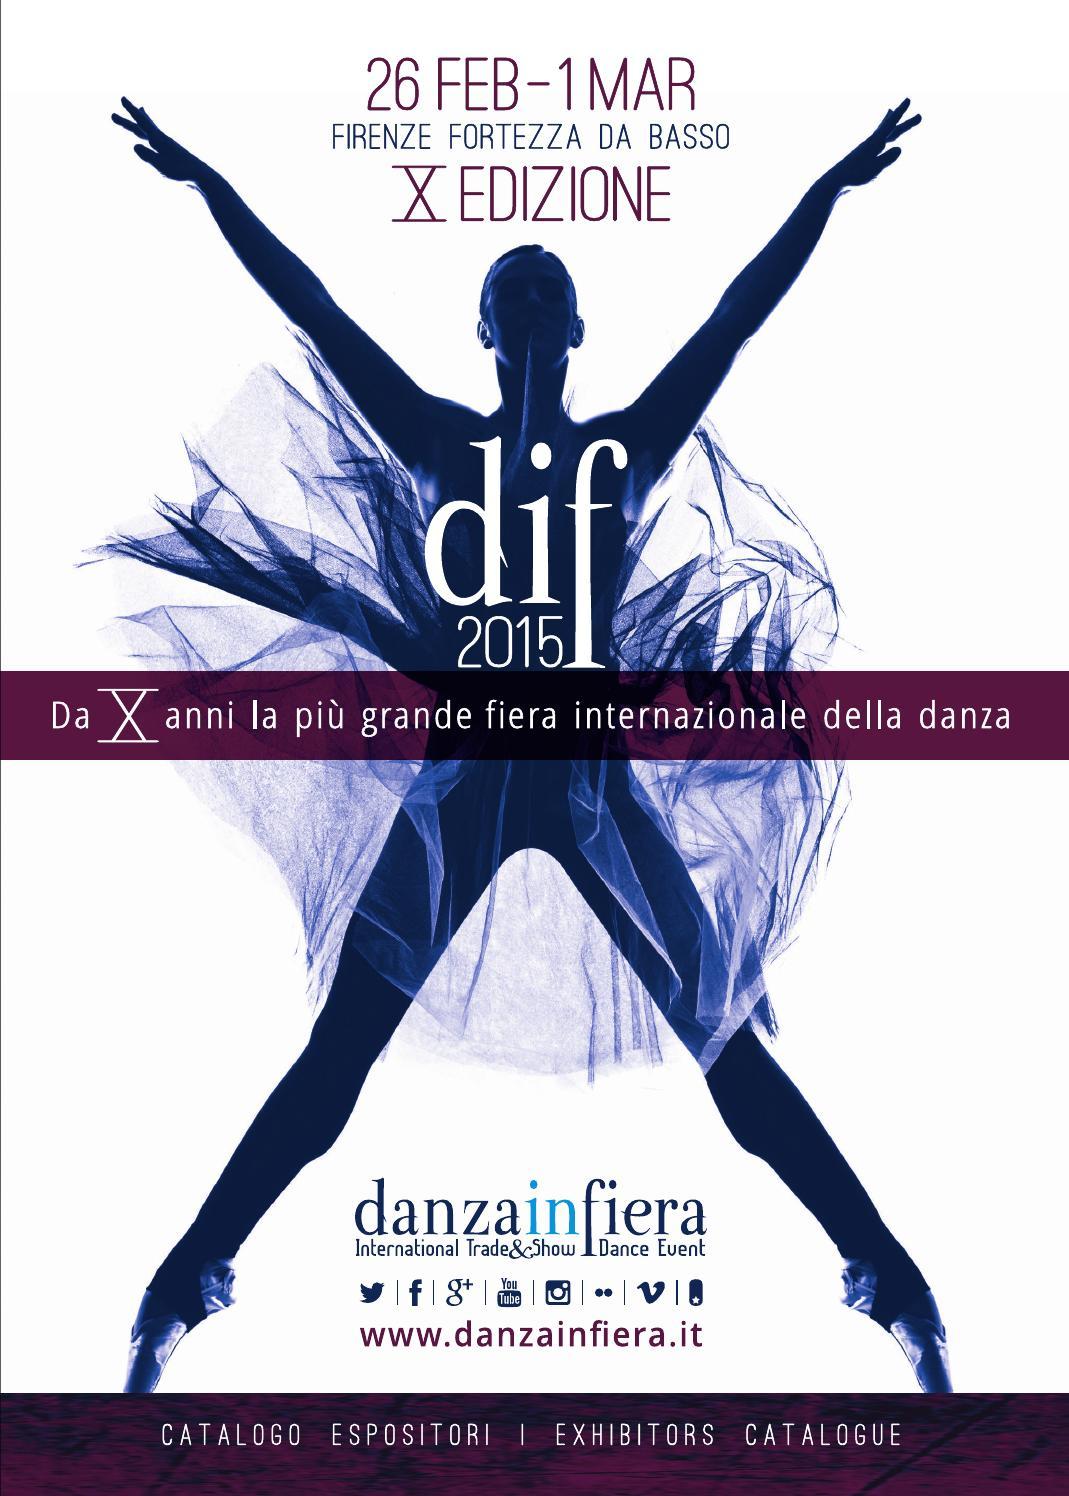 Dif2015 catalogo X edizione by Danzainfiera issuu